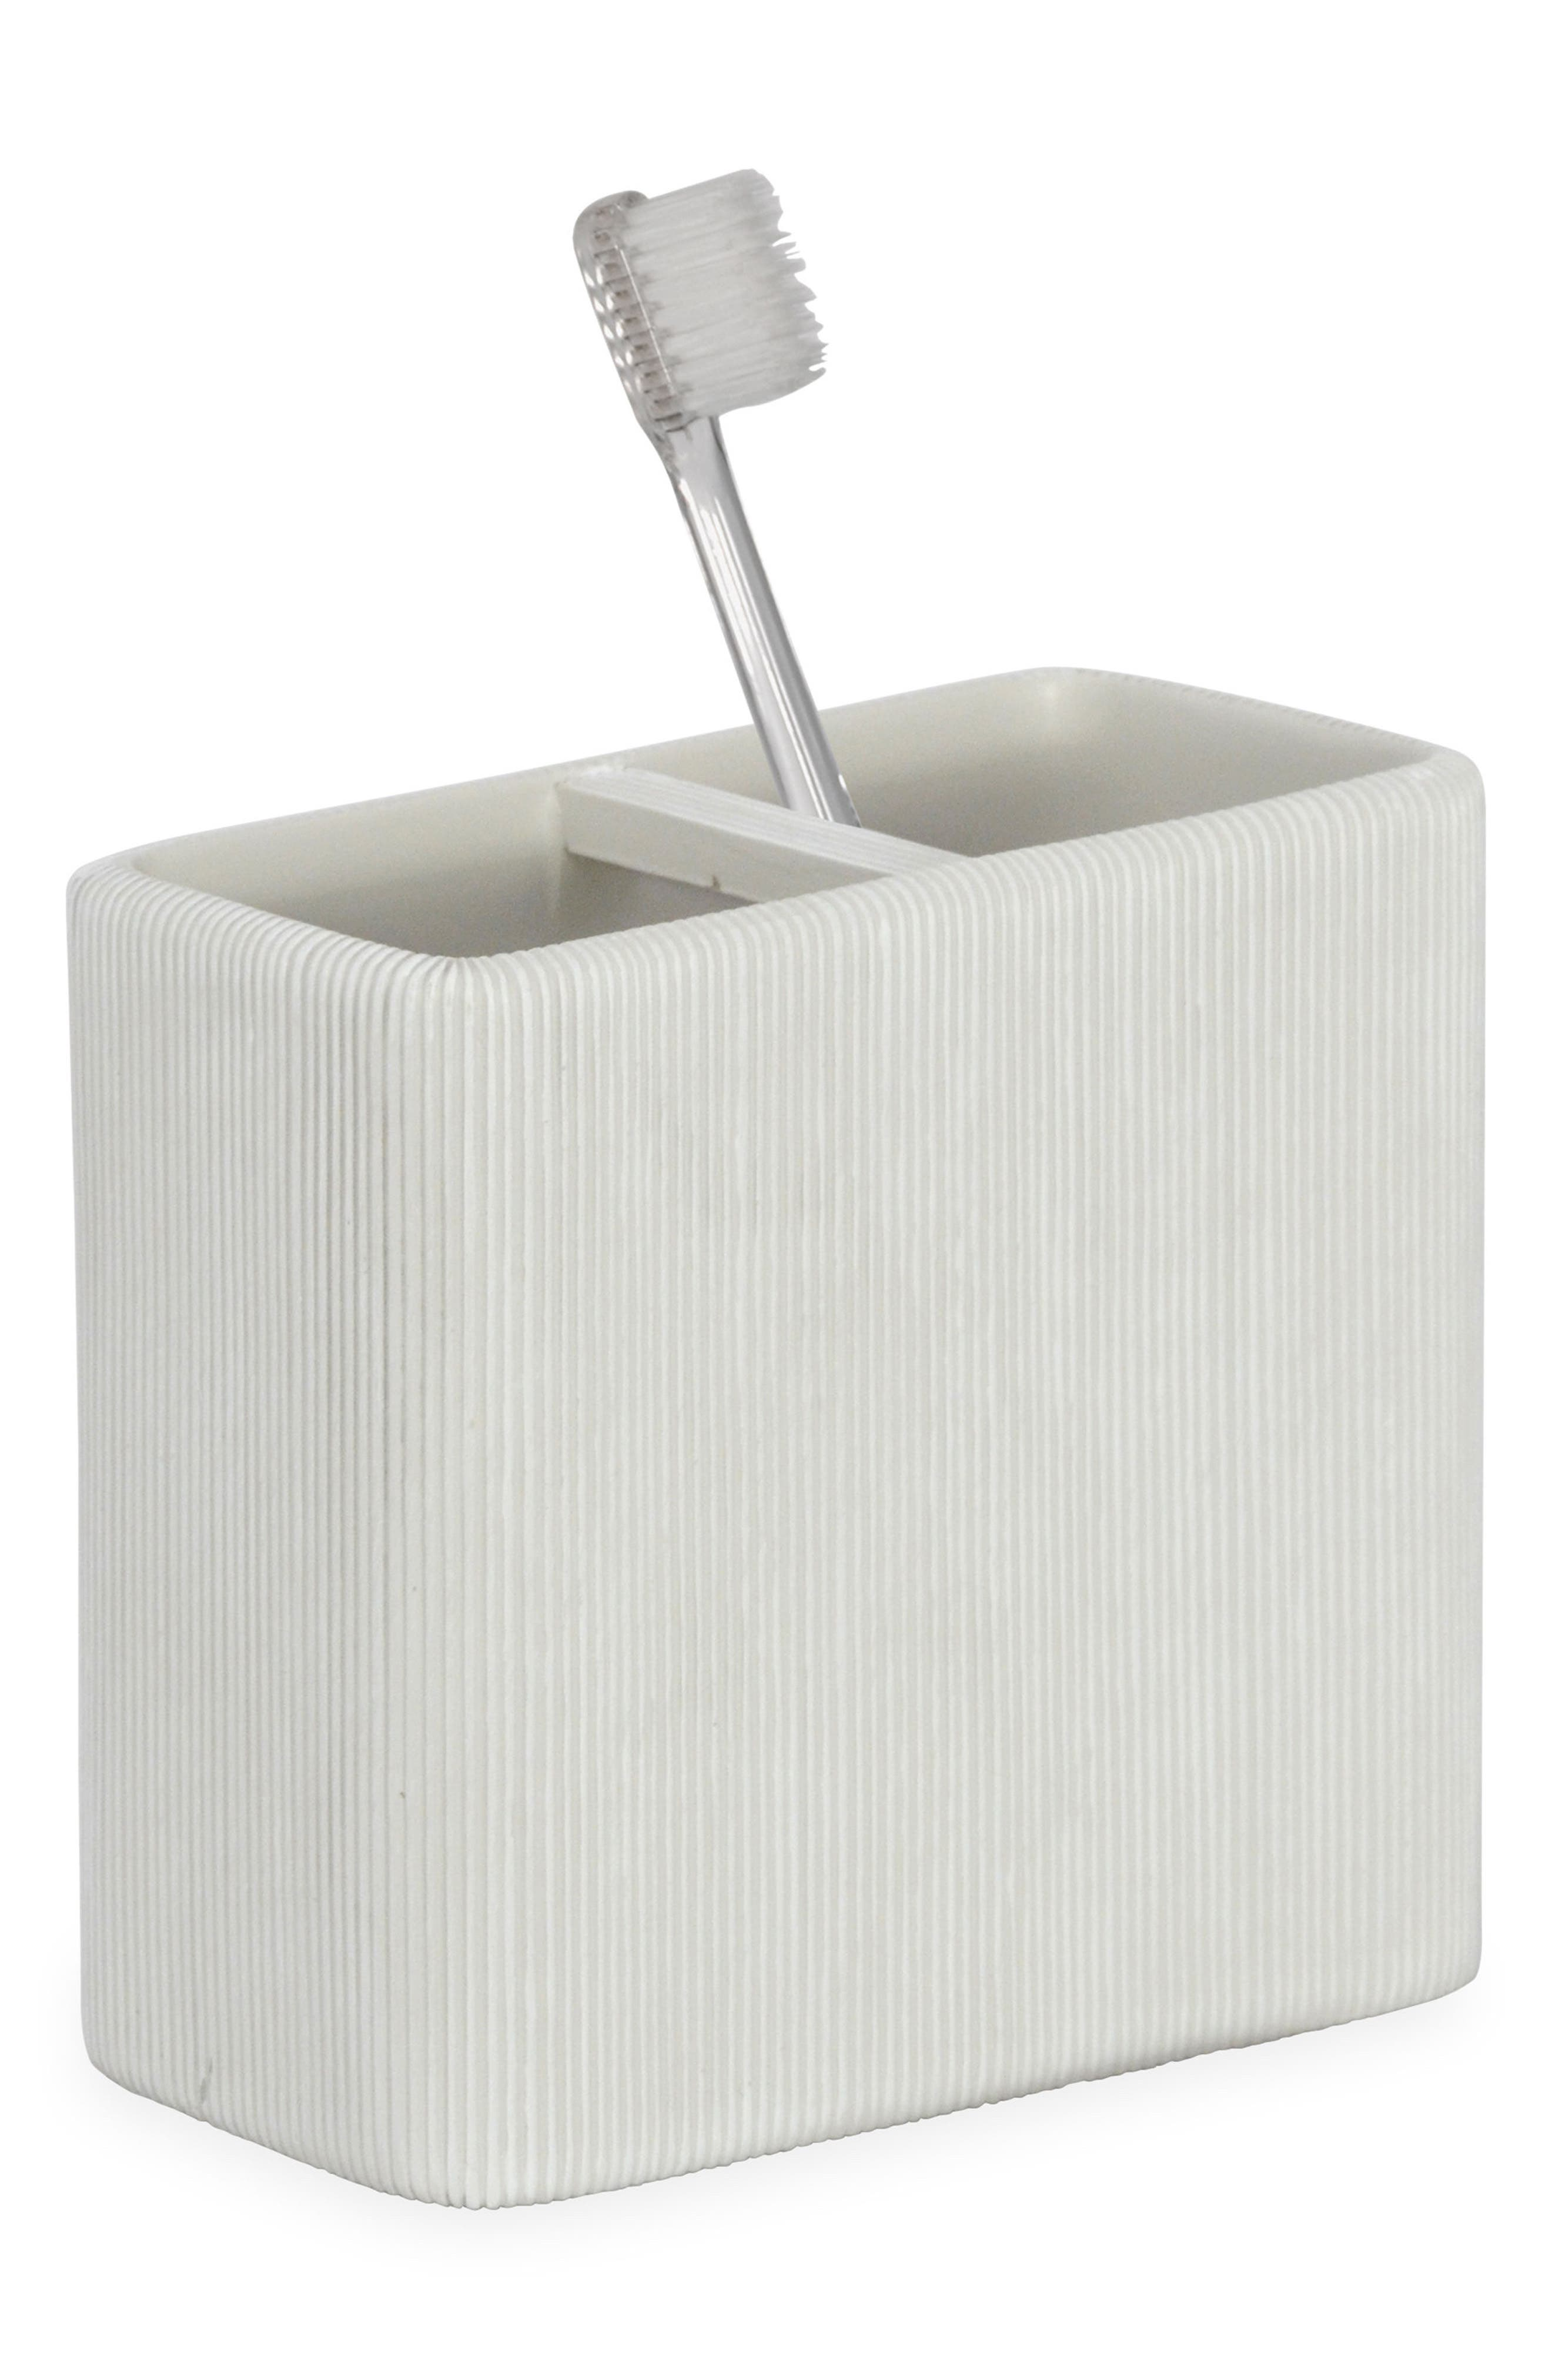 DKNY Fine Lines Ceramic Toothbrush Holder